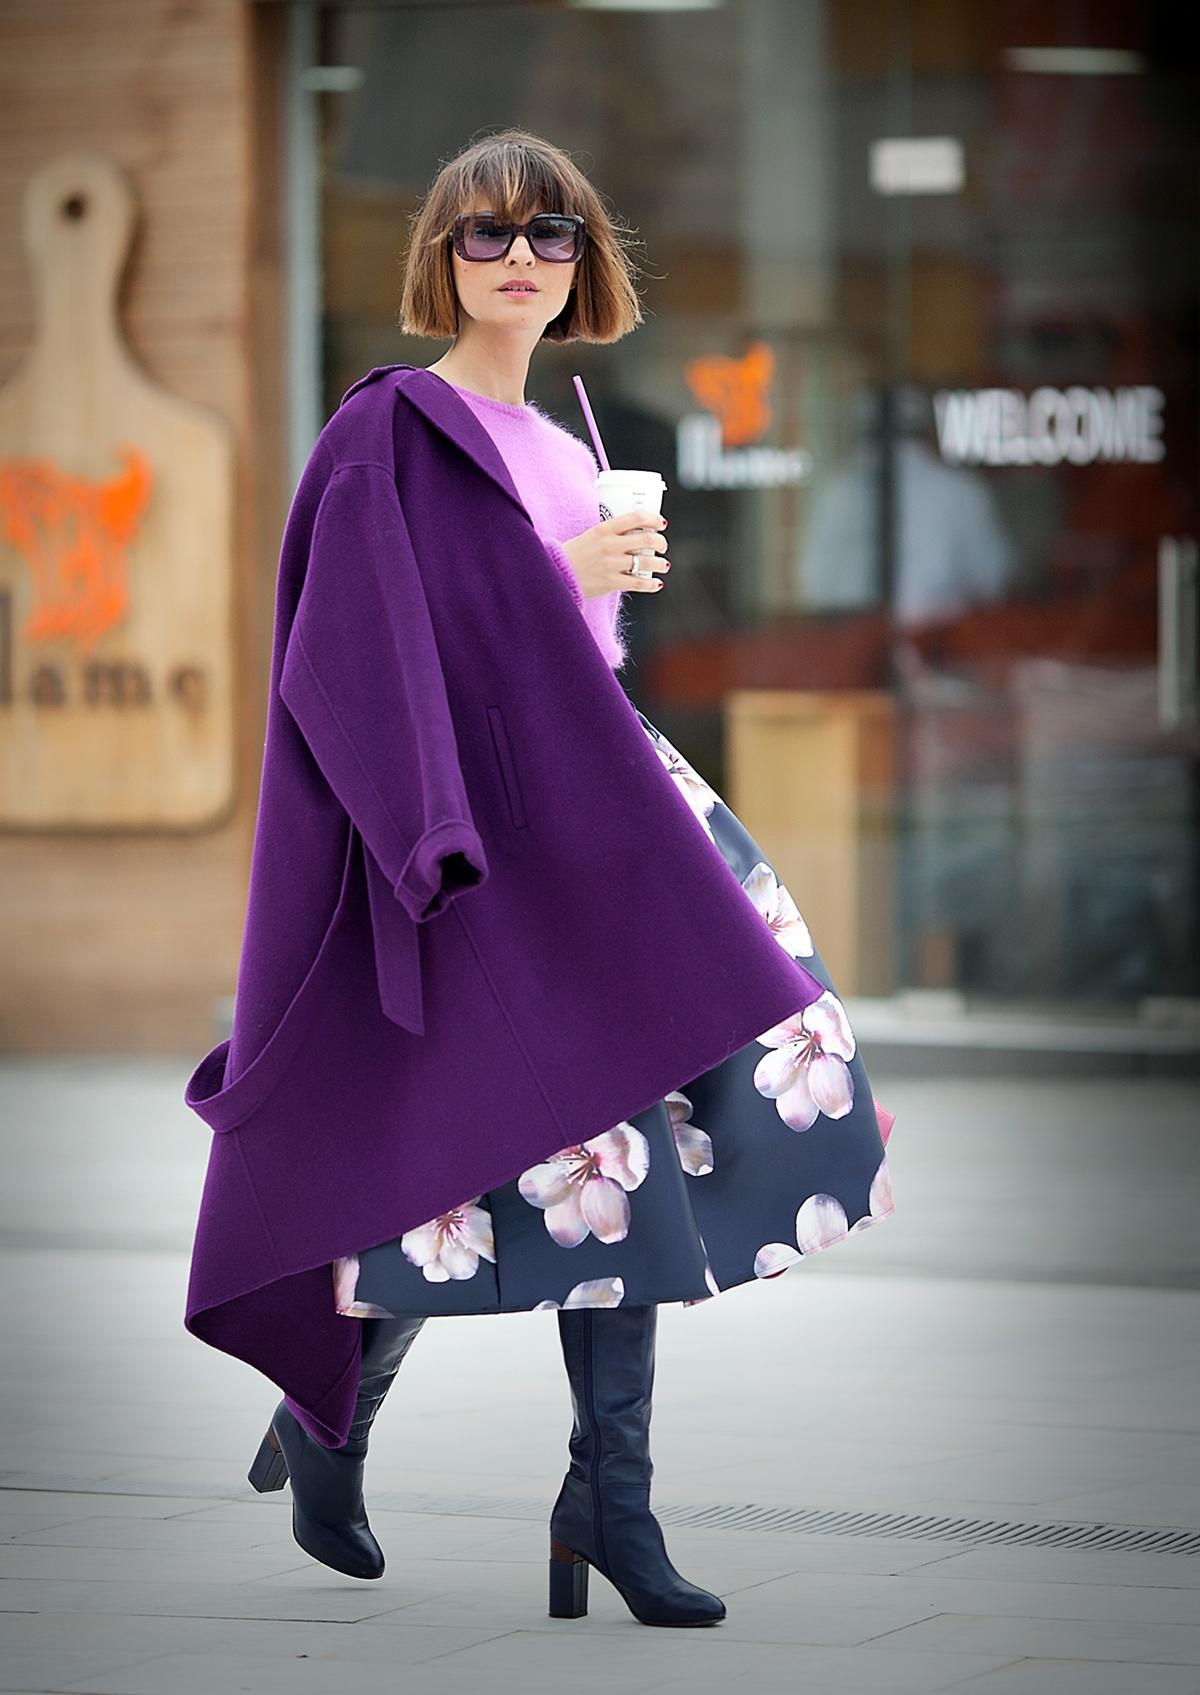 purple coat by MaxMara on Galantgirl.com